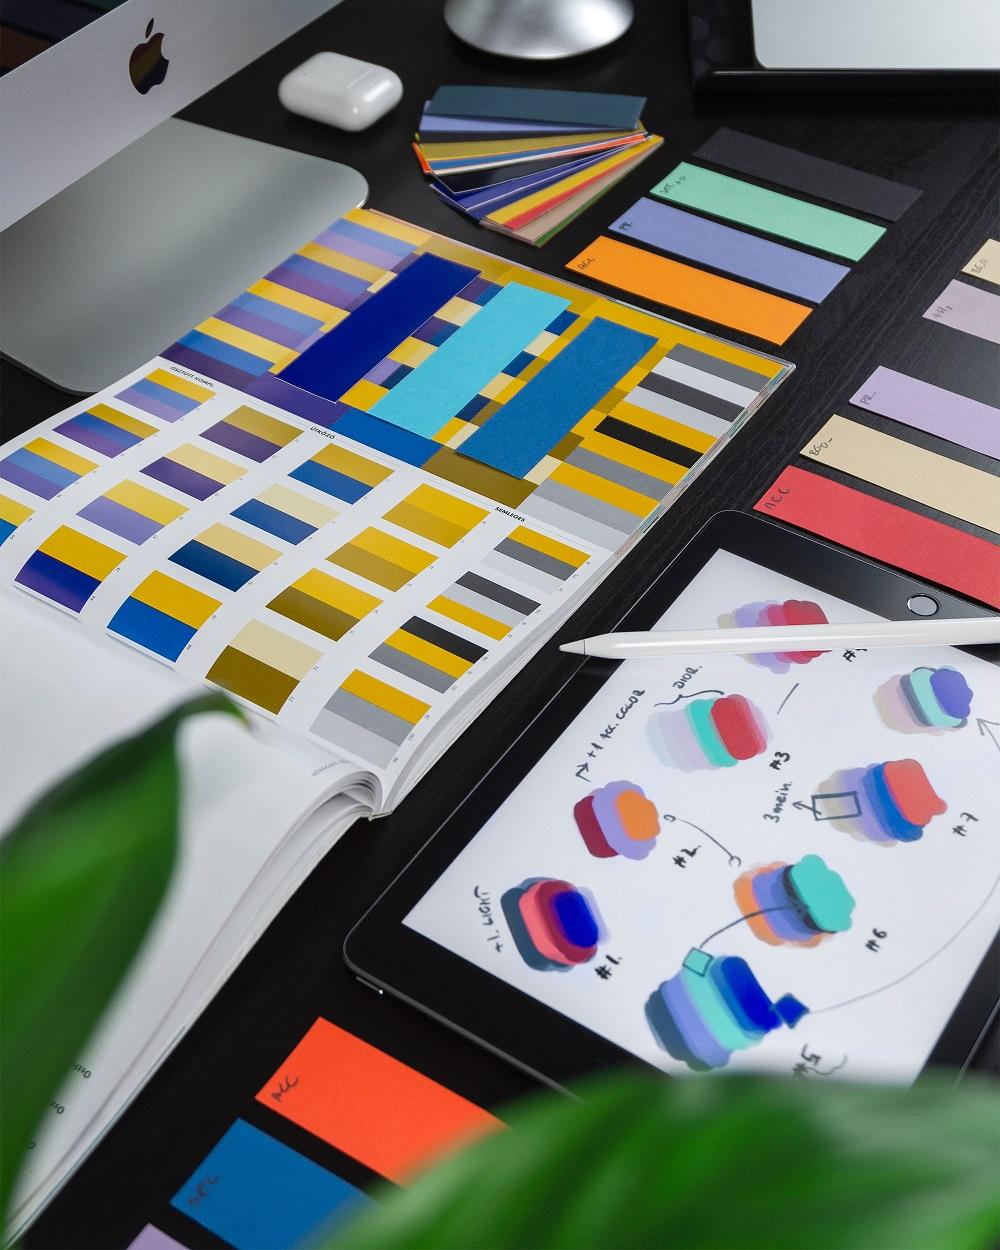 desk covered in card color palettes